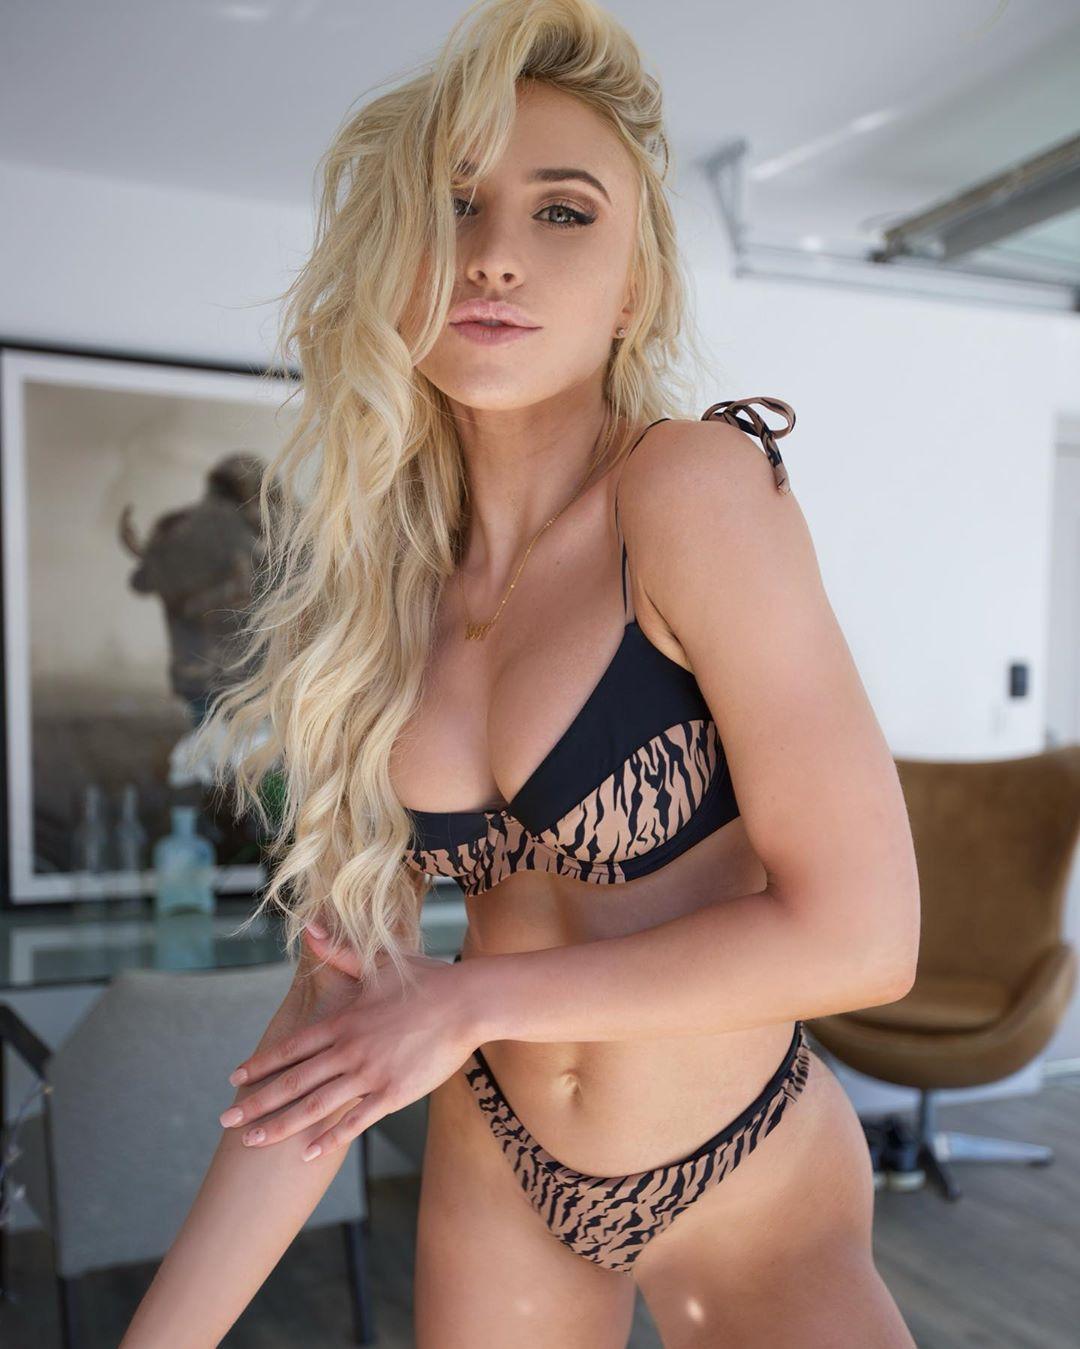 Lauren Dascalo Nude Onlyfans Leaked! 0033